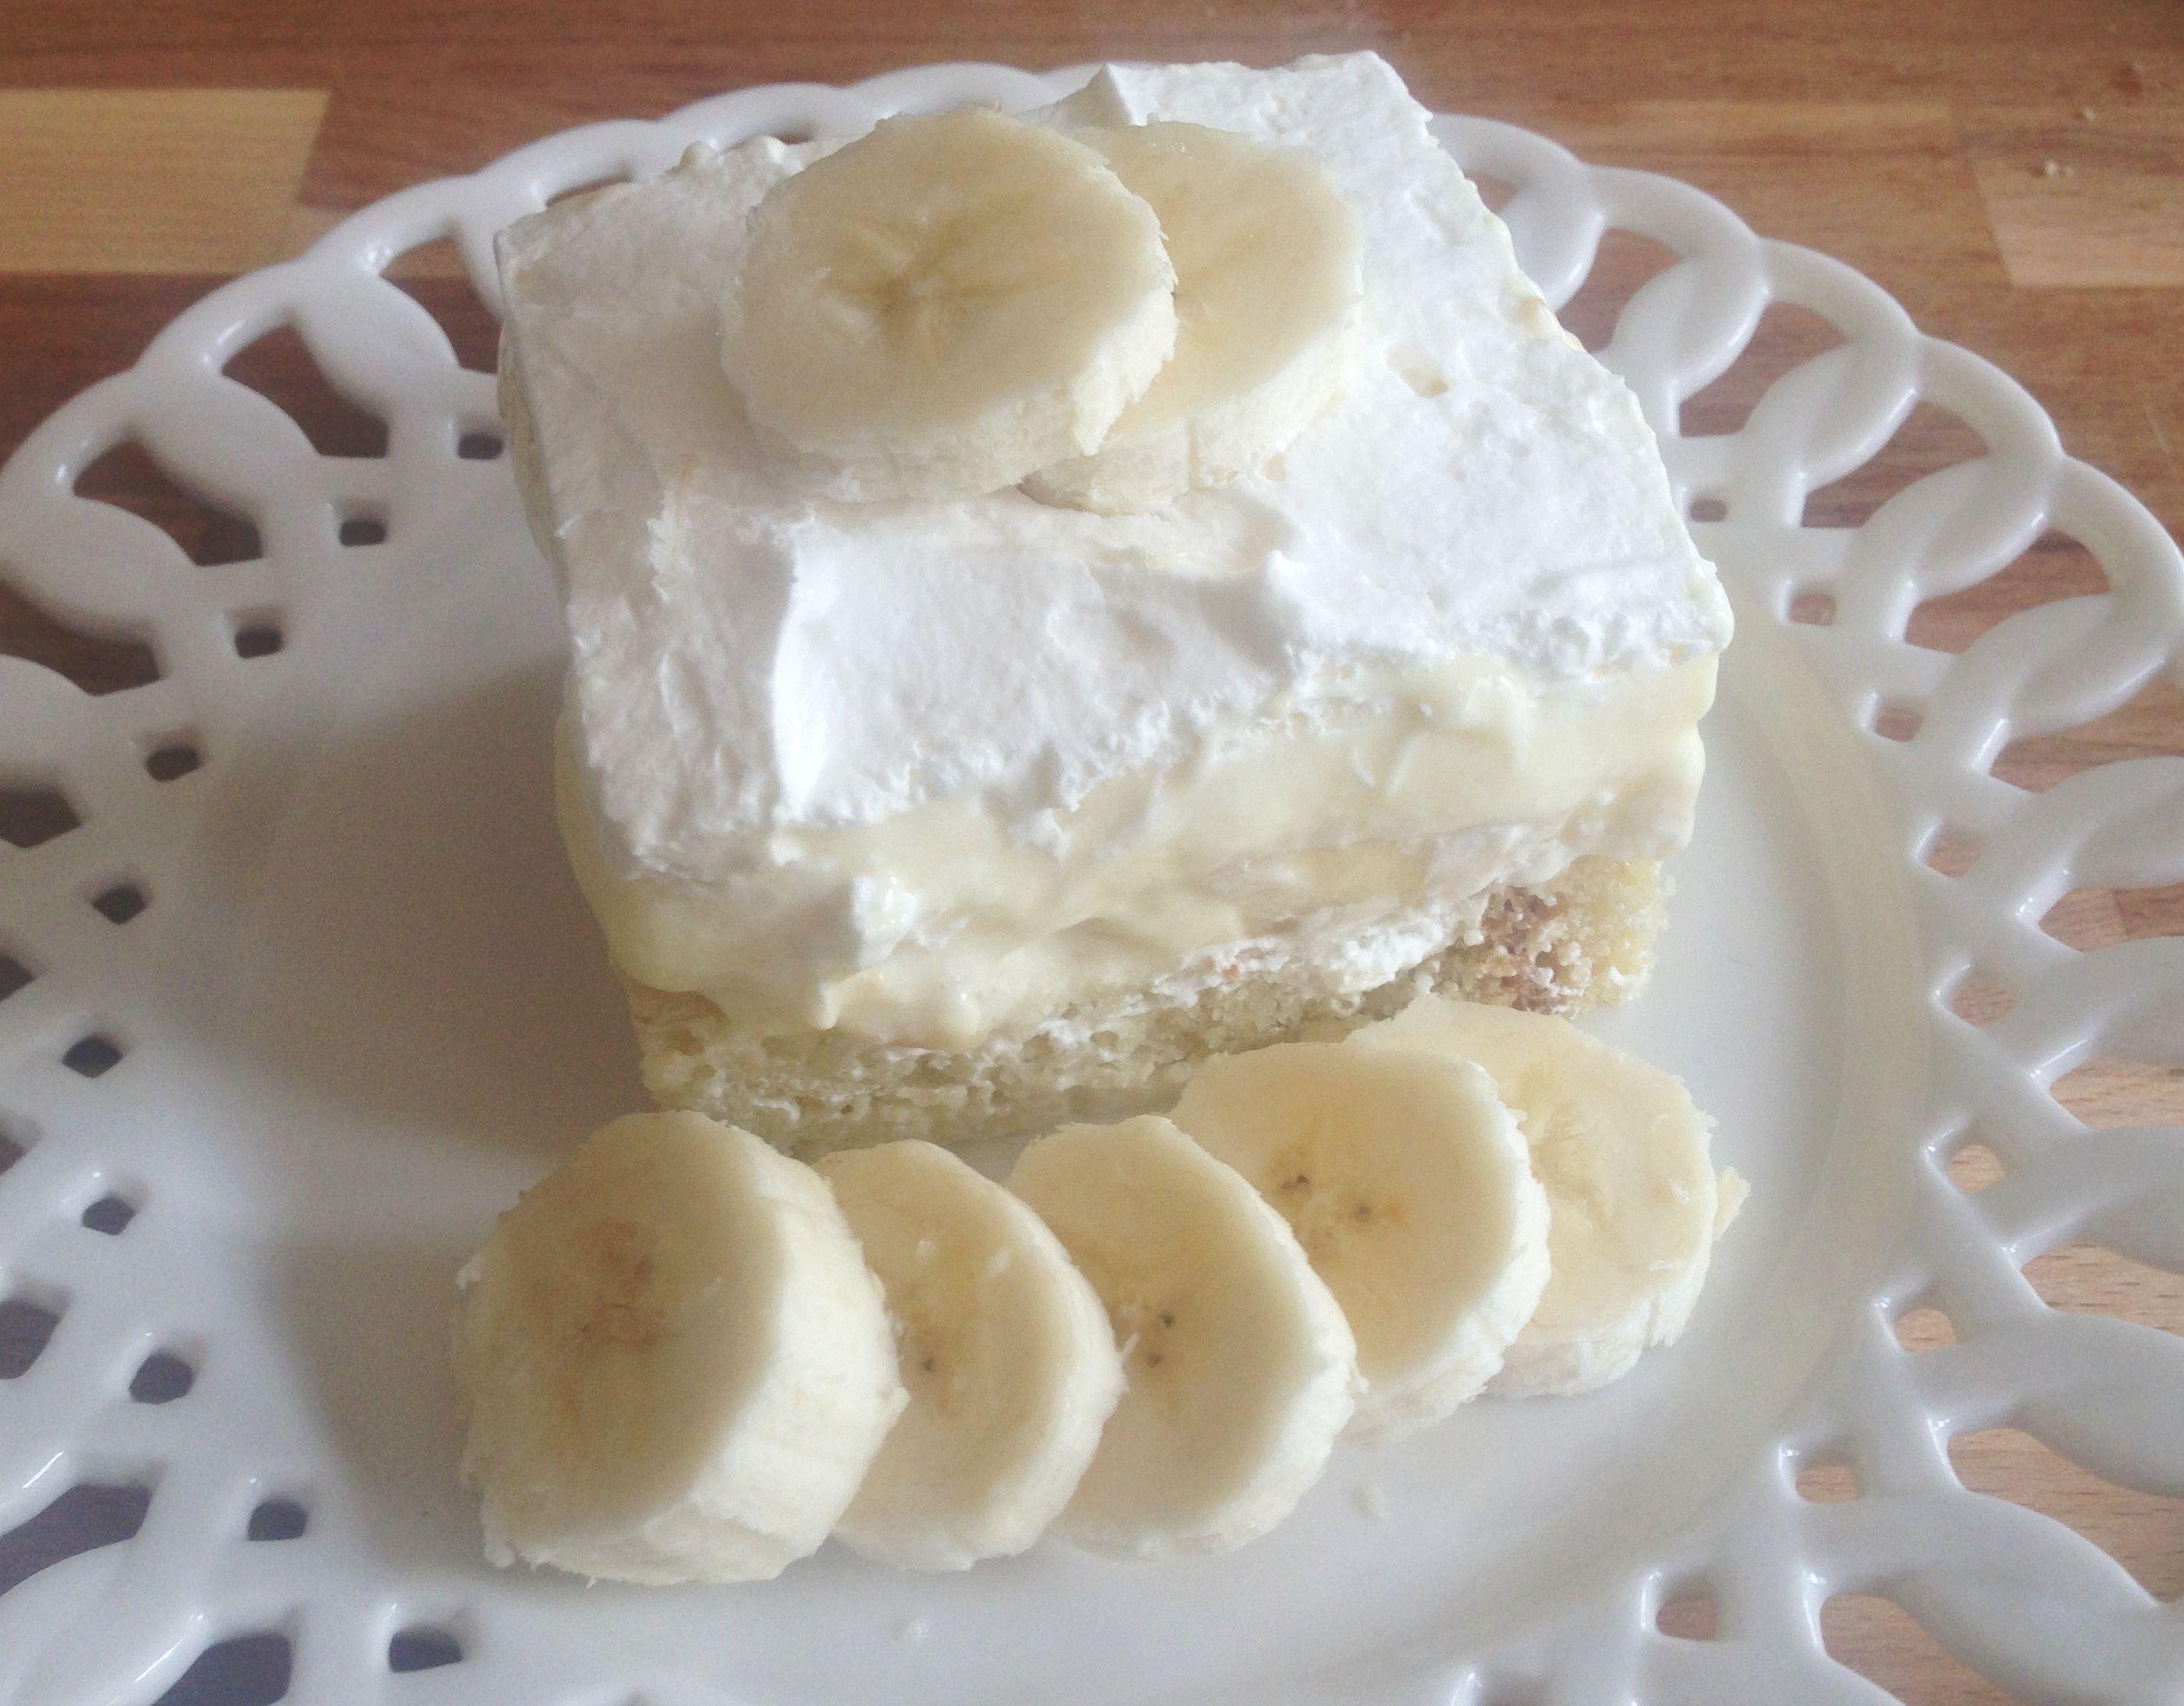 Bananas & Cream Layered Pound Cake Dessert Recipe